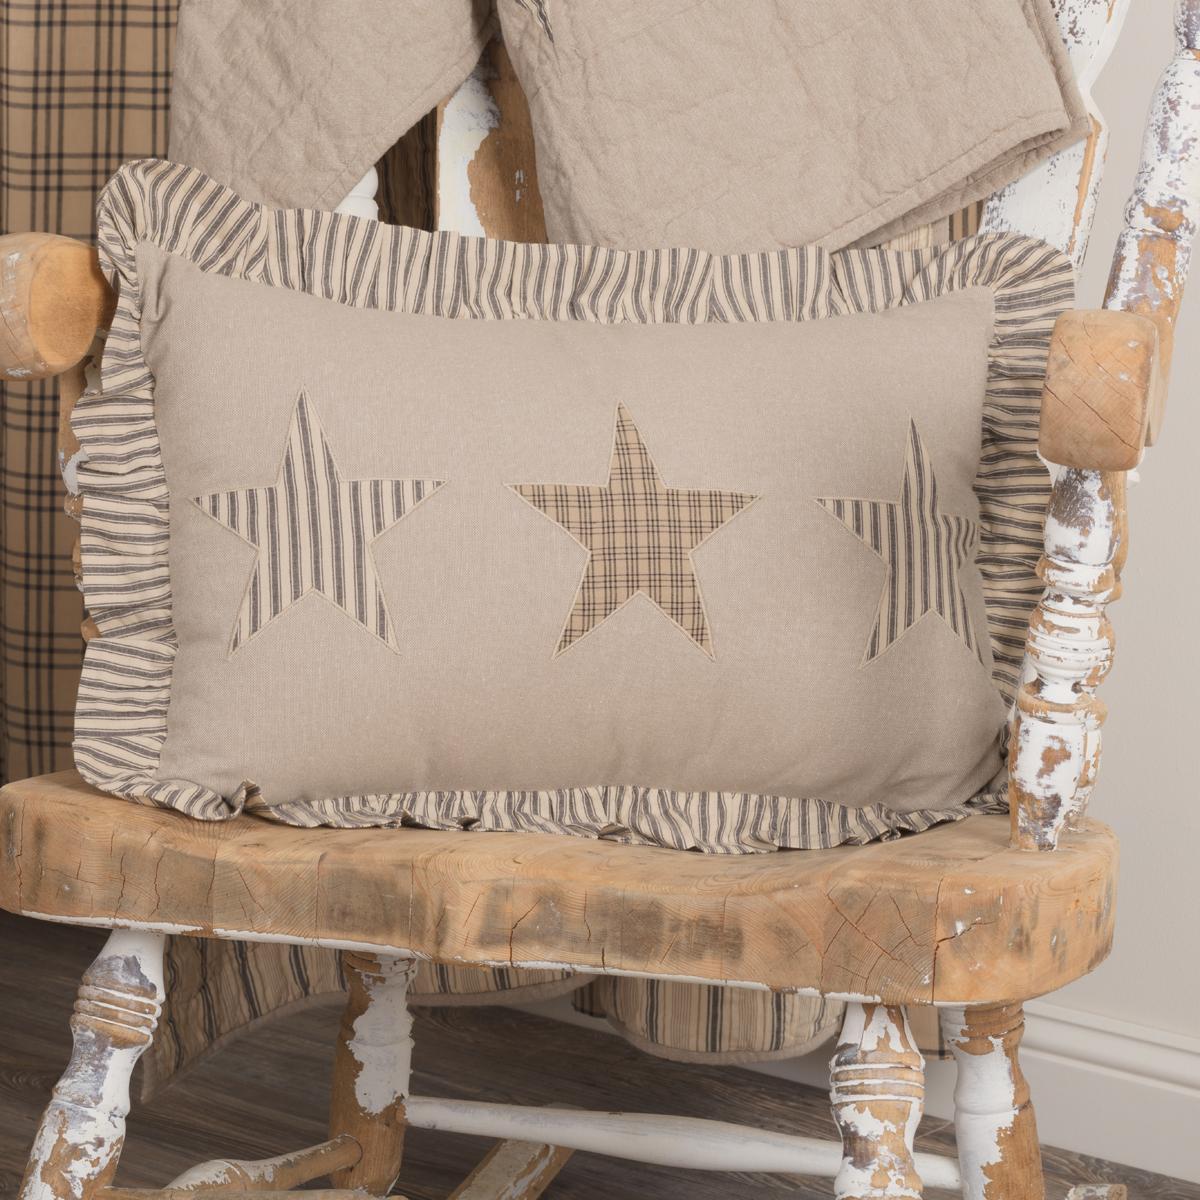 SAWYER MILL STAR FARMHOUSE accent throw pillow Farm Style 14